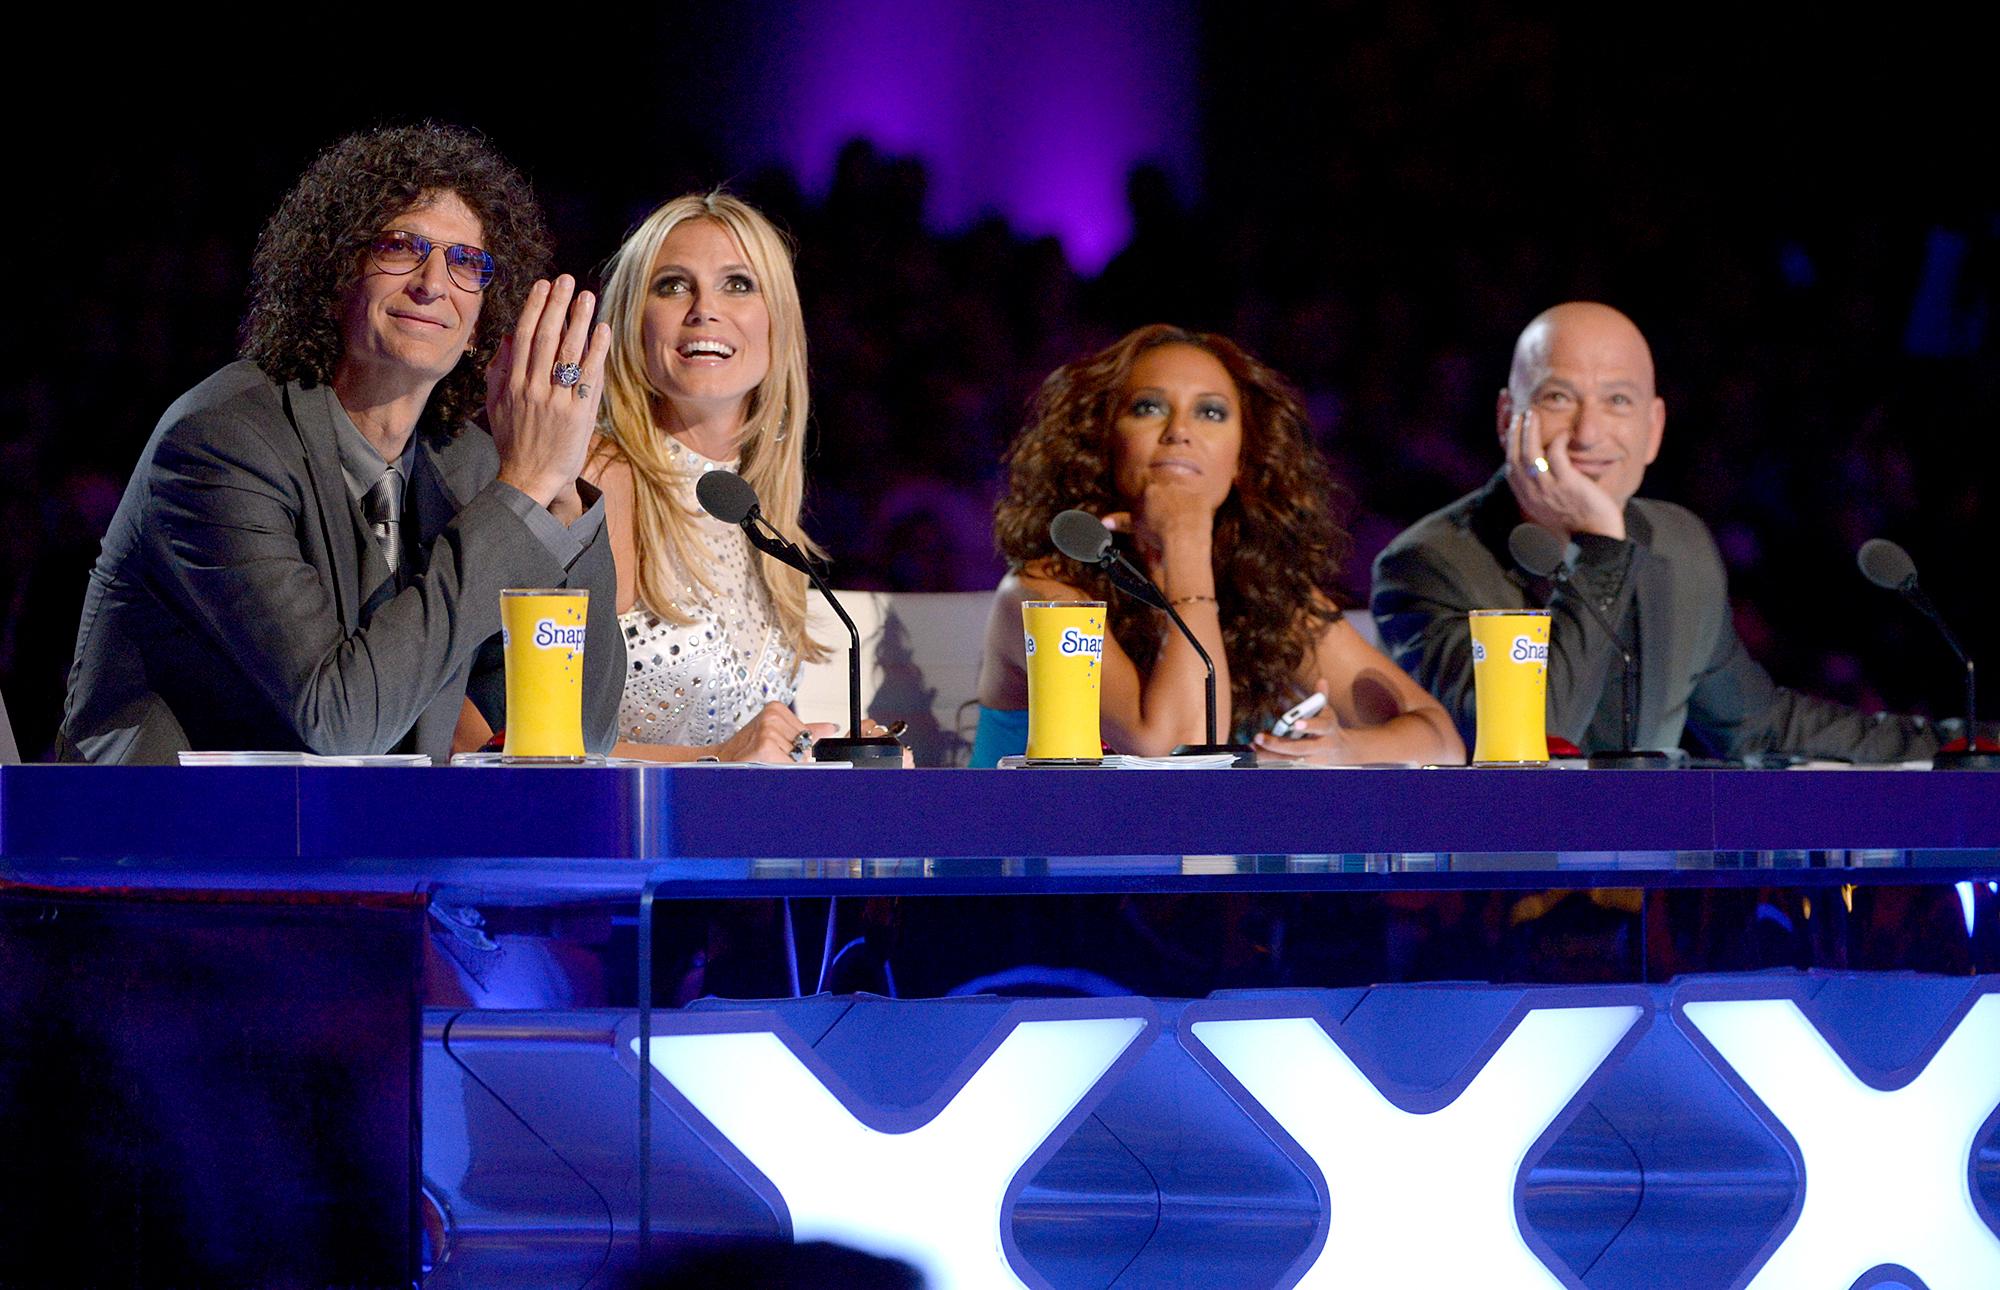 Howard-Stern,-Heidi-Klum,-Mel-B,-Howie-Mandel-Americas-Got-Talent